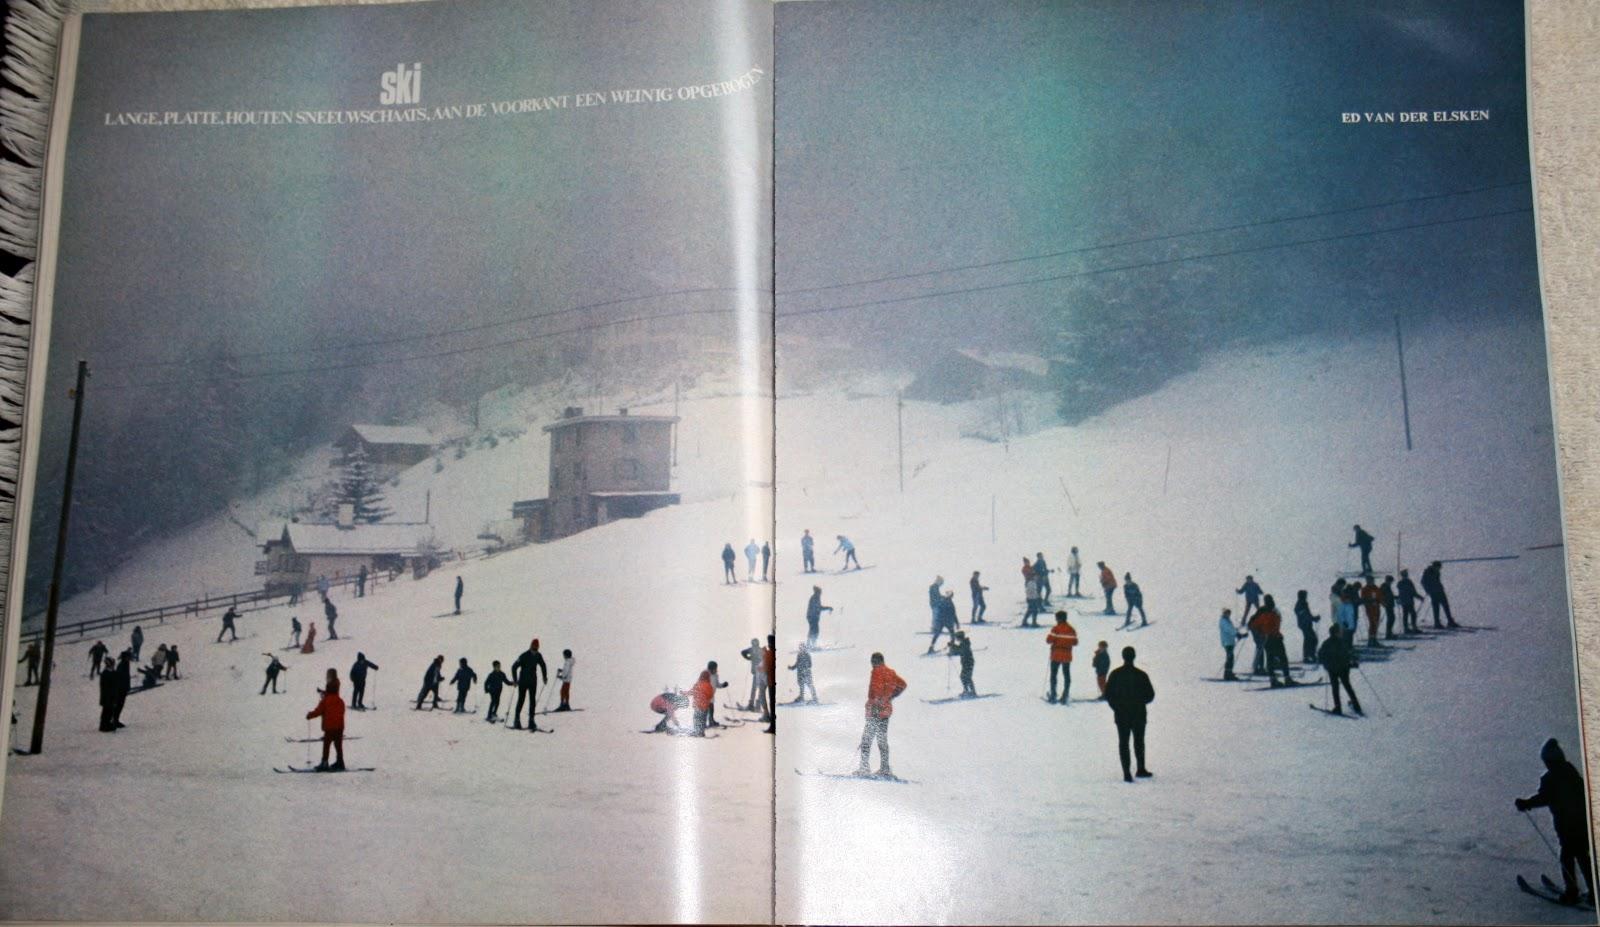 1967 Sweet Life Book Ed Van Der Elsken Photographs 1st Edition w/ Press Release